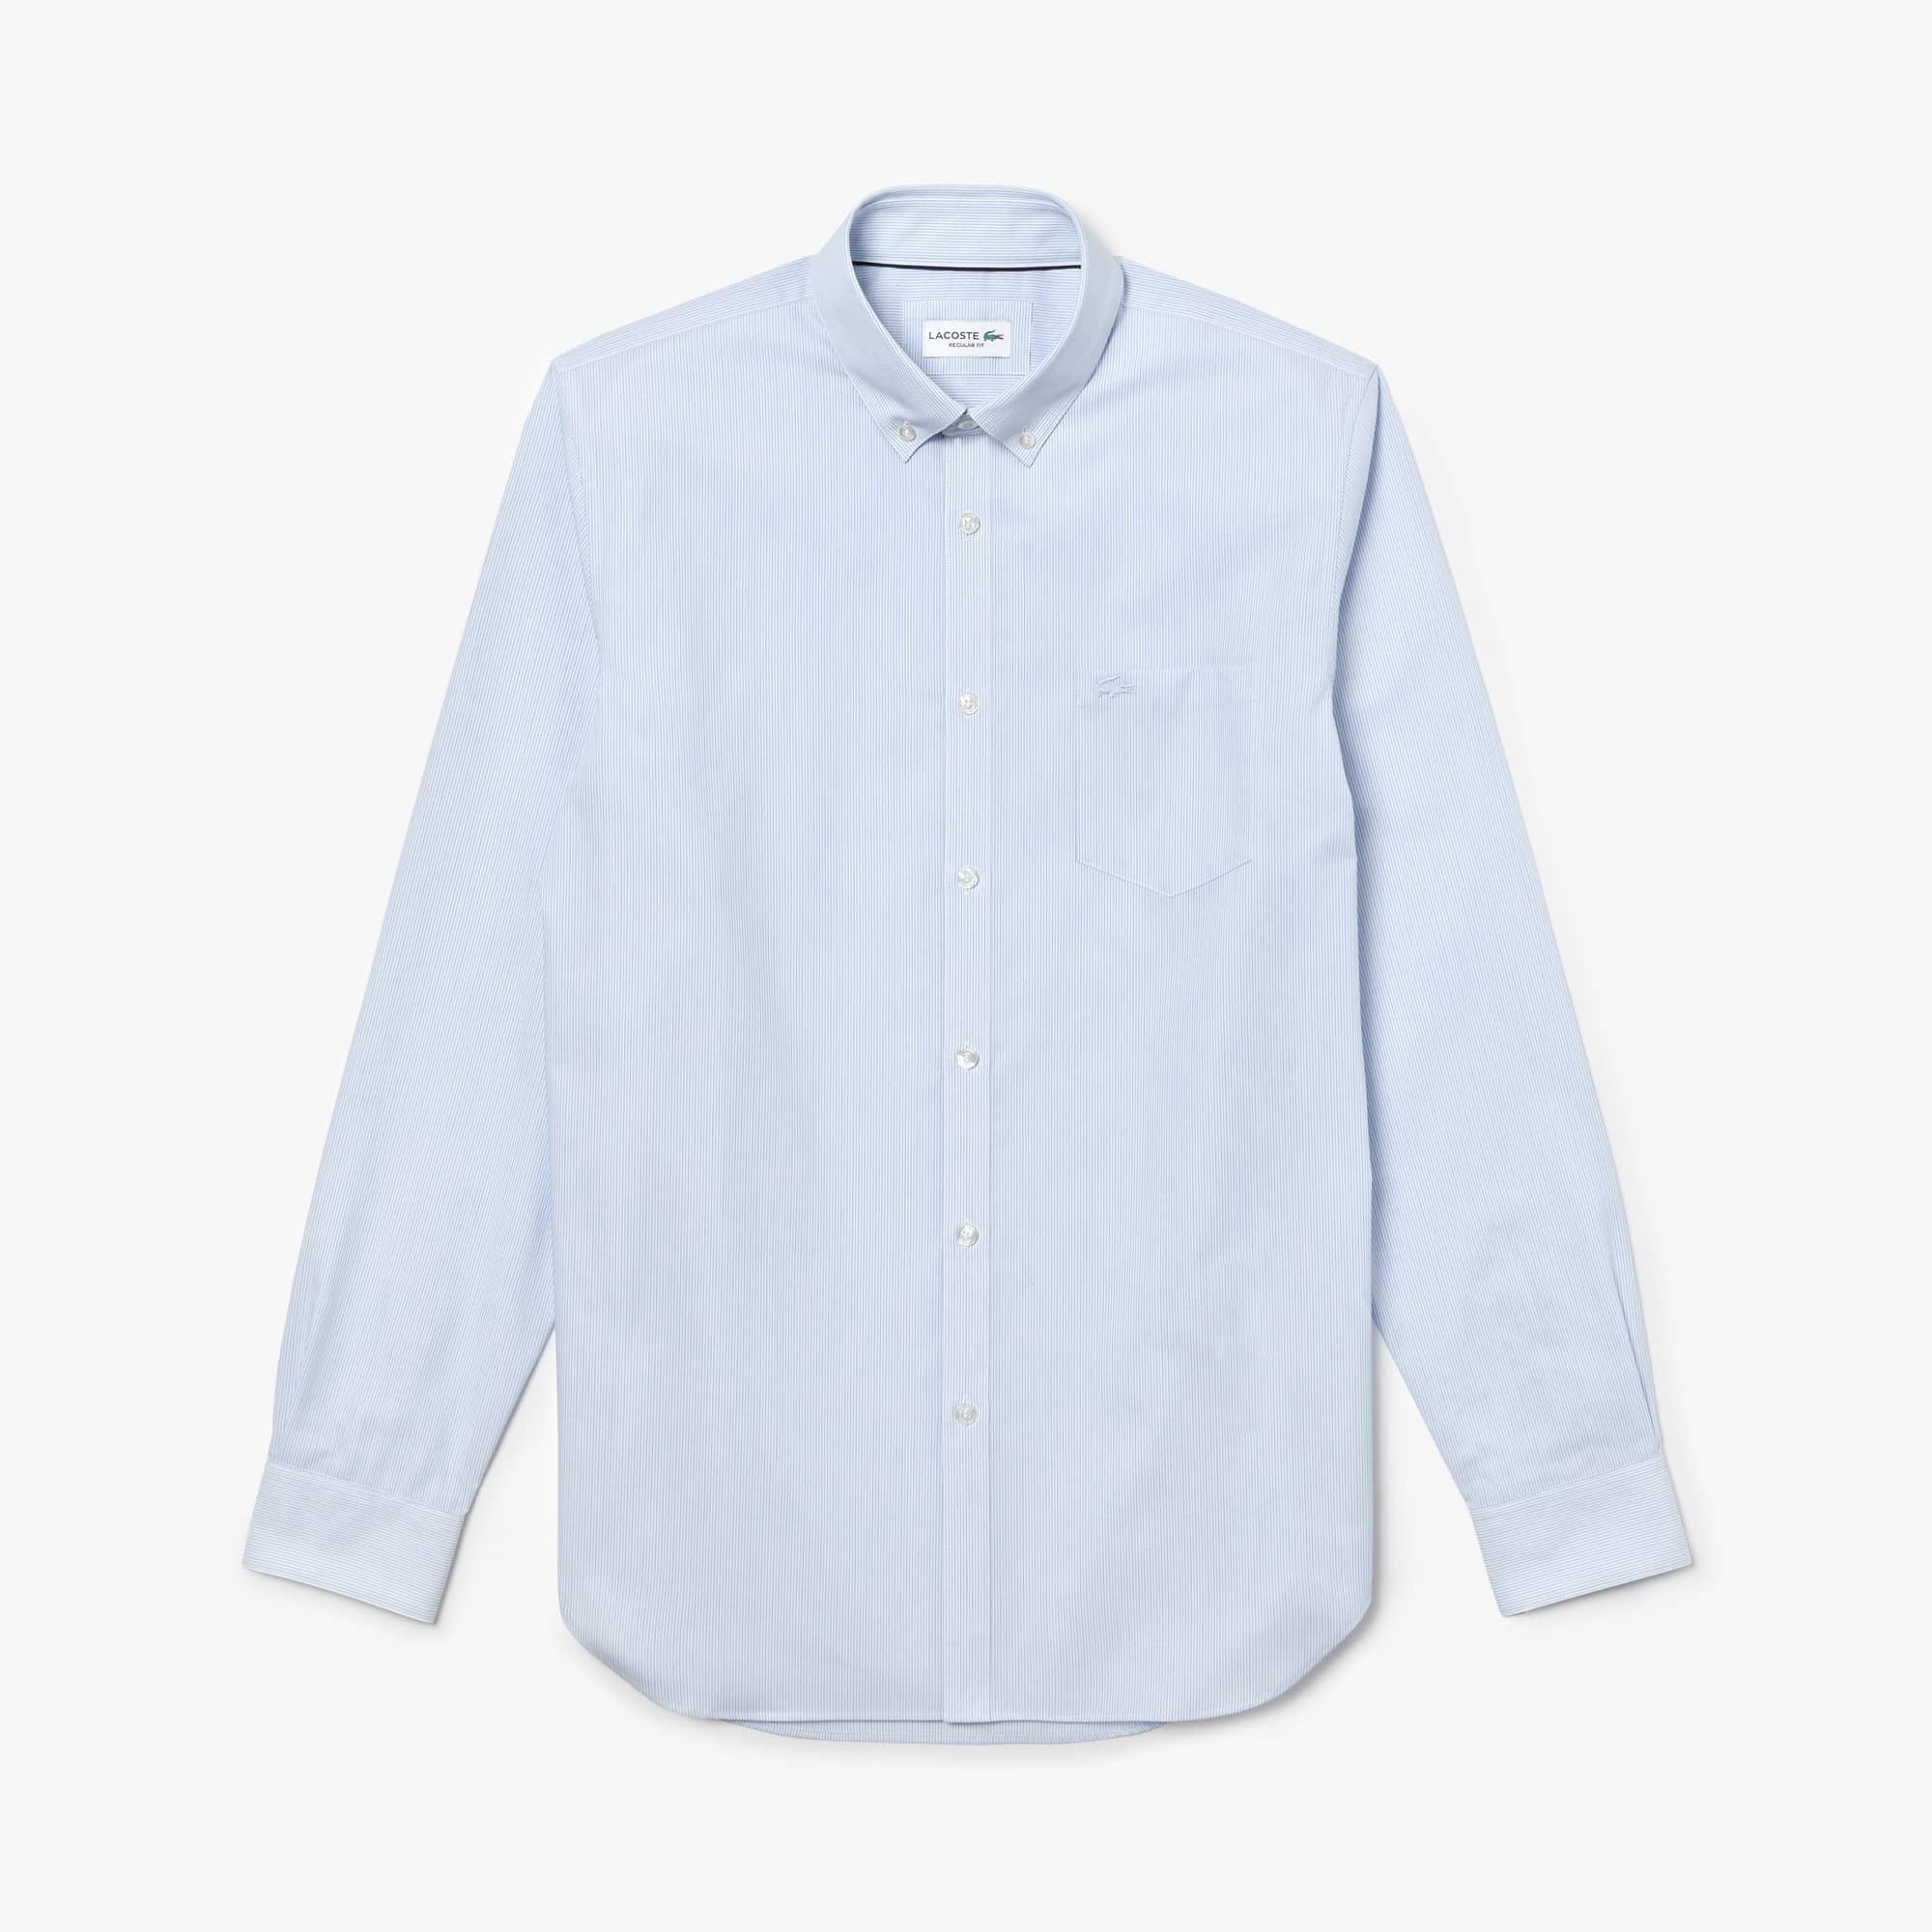 Men's Regular Fit Striped Cotton Poplin Shirt